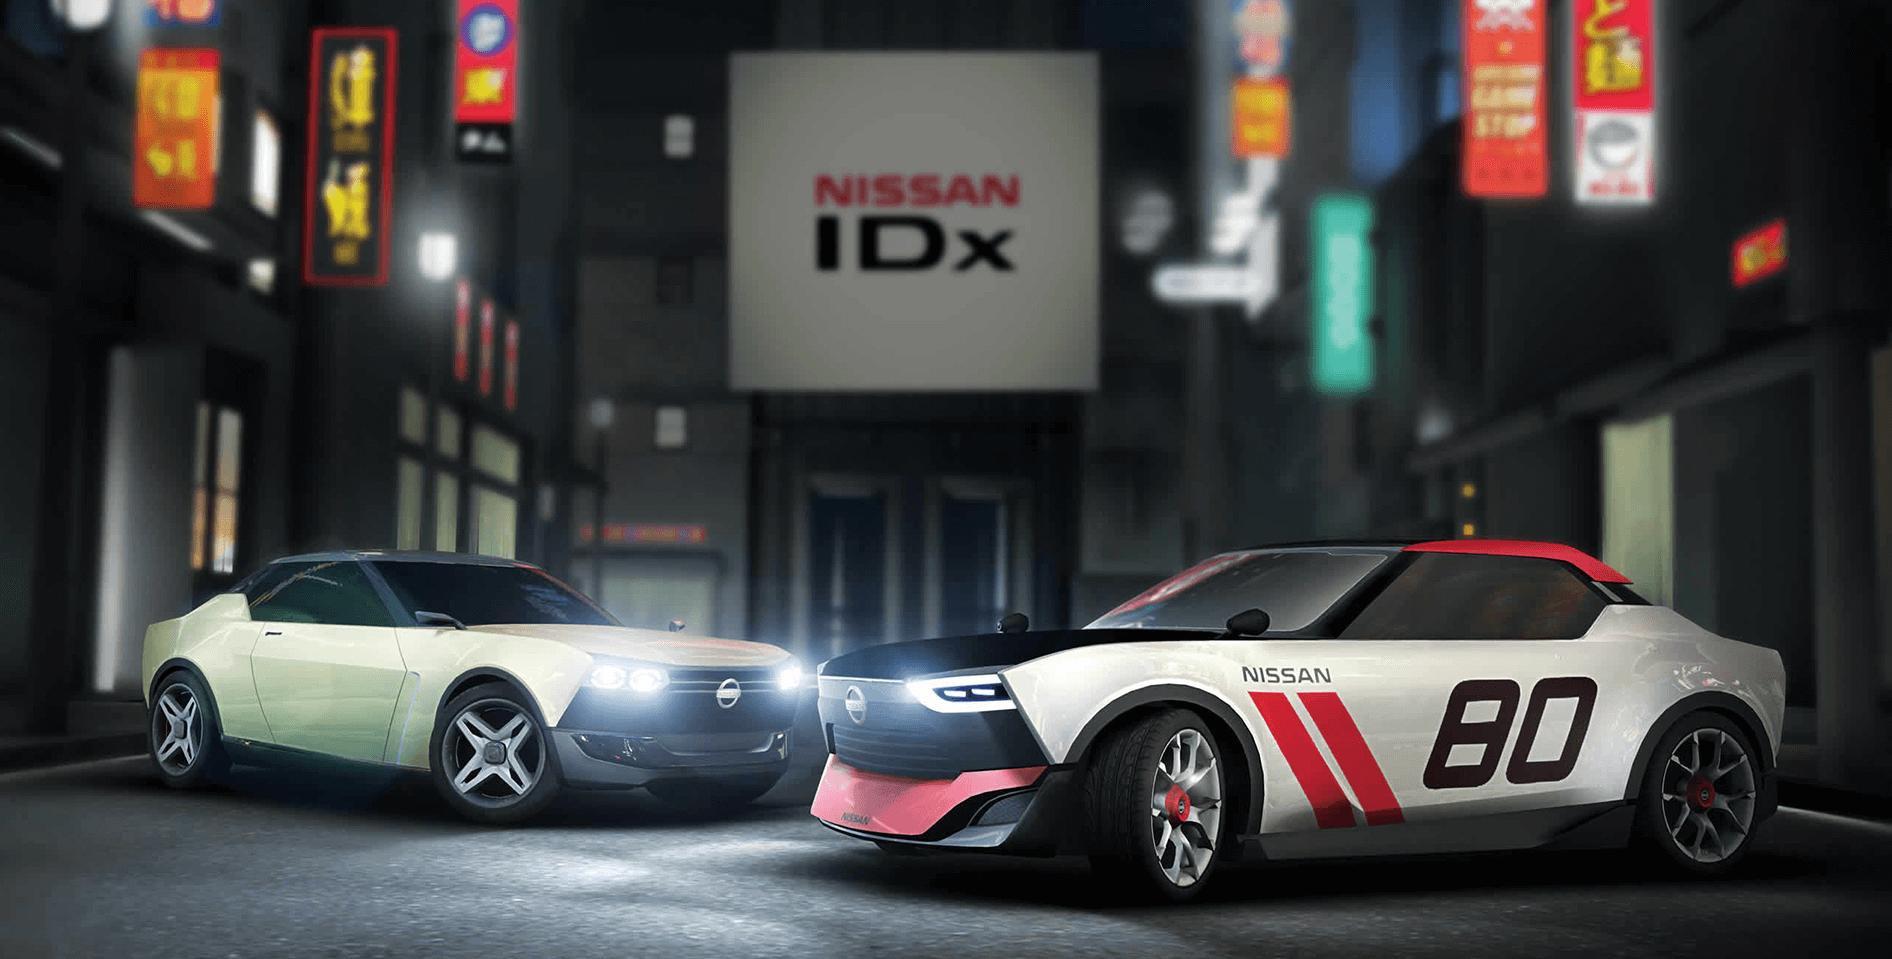 Nissan IDX VR